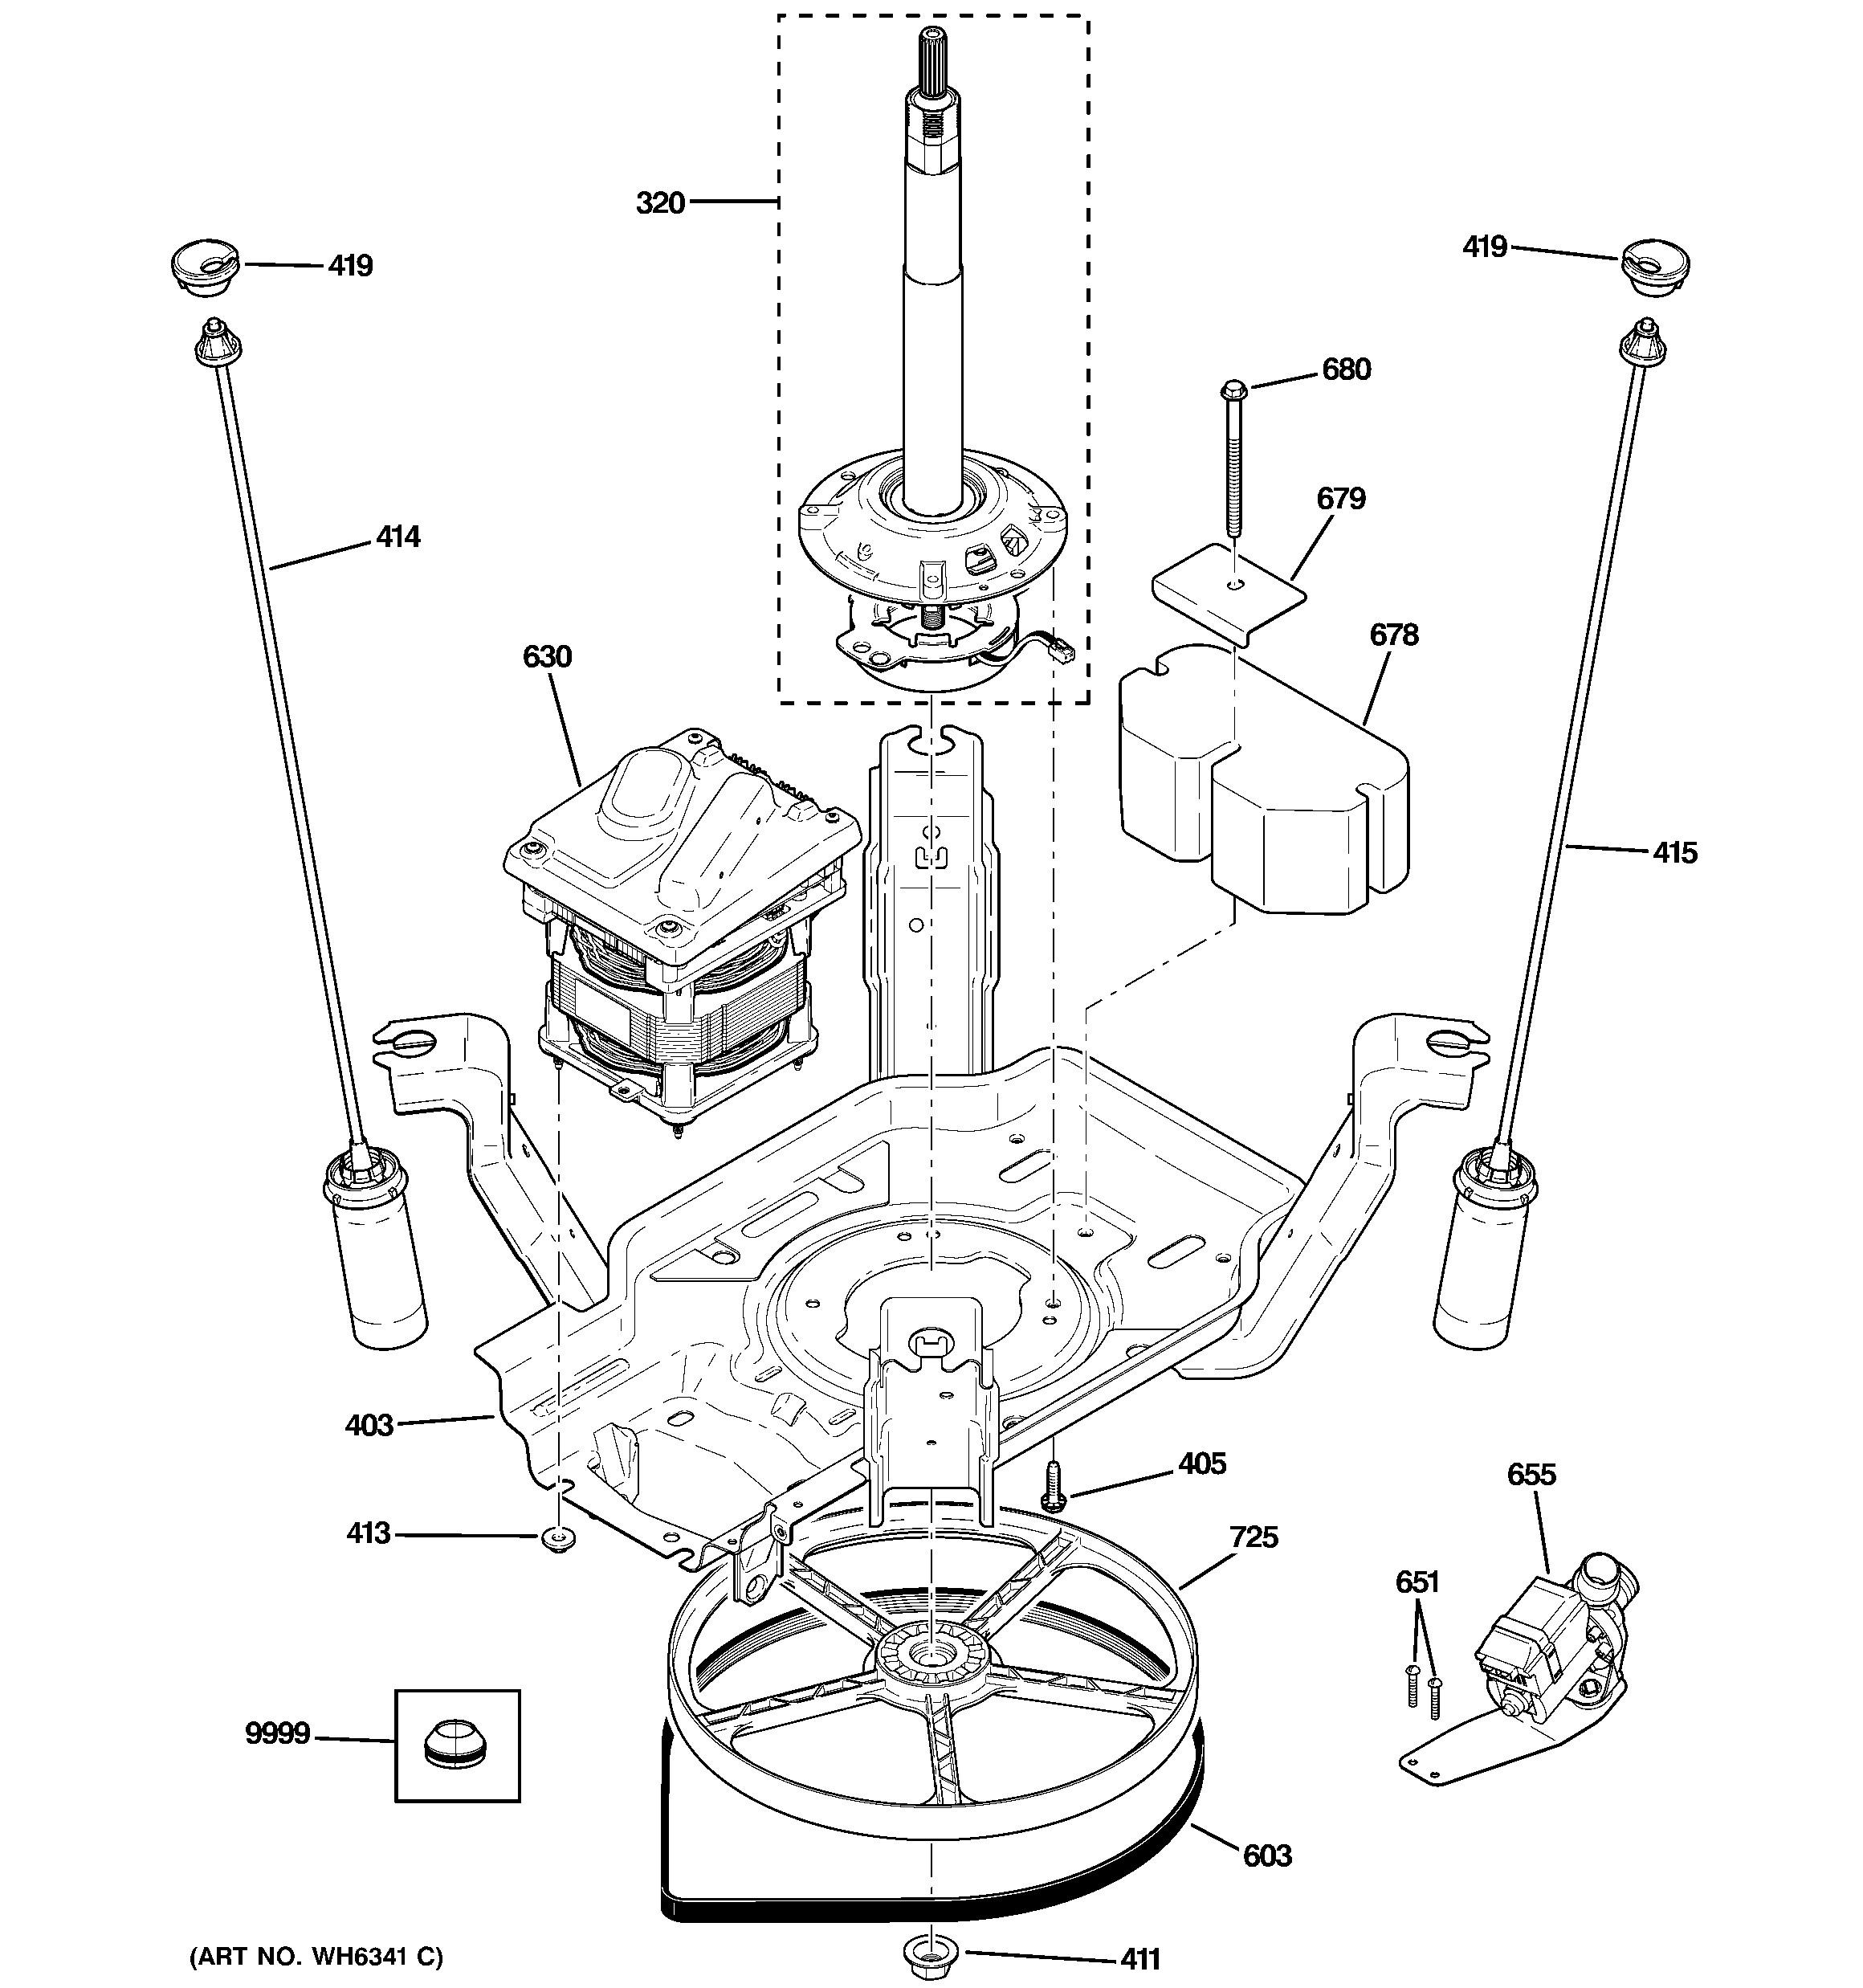 Honda Pressure Washer Parts Diagram My Wiring Ge Model Whdsr316g0ww Of